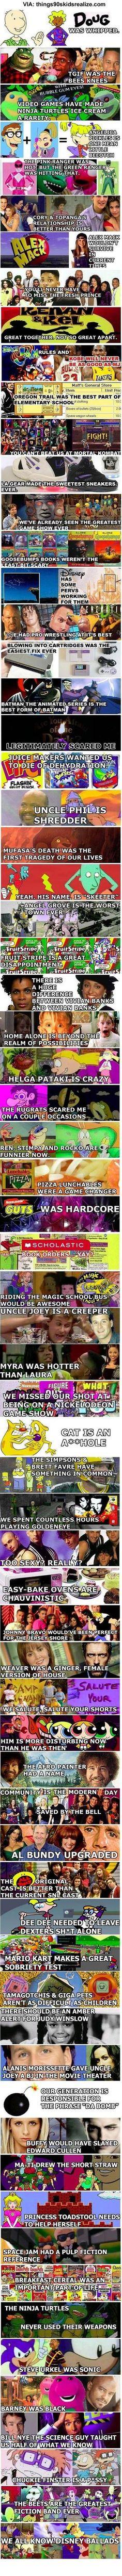 90's TV rocked.